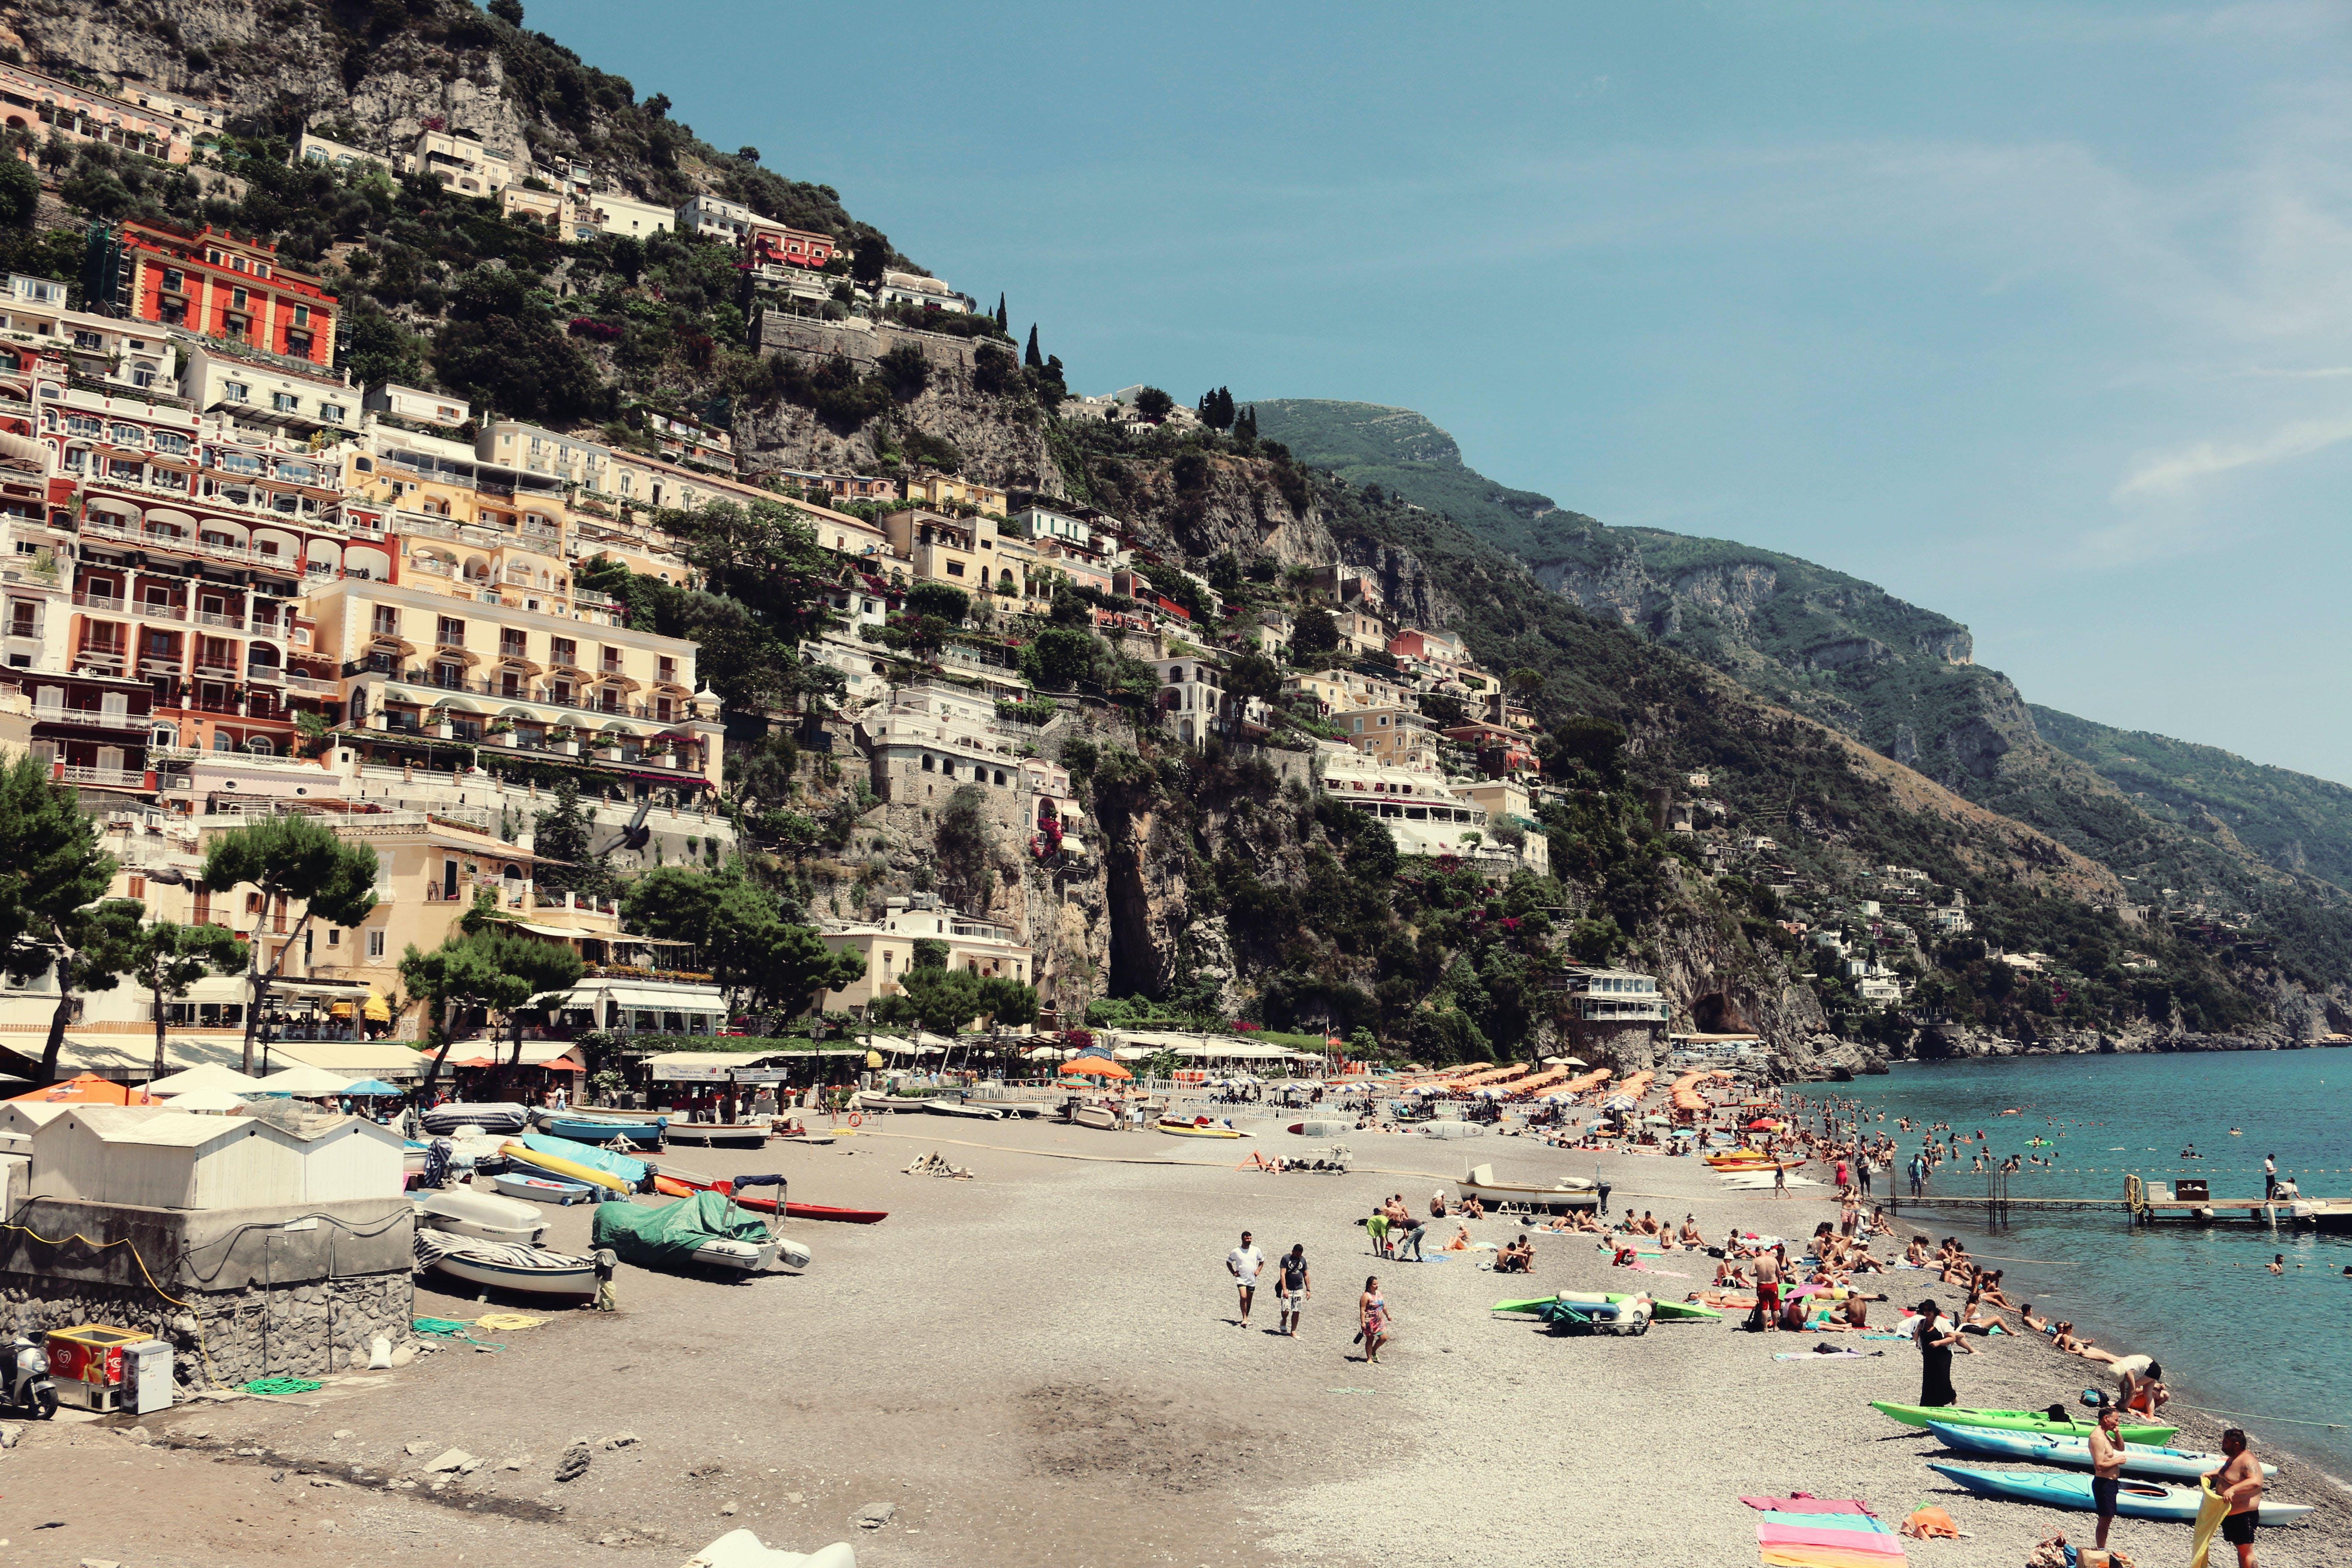 Landscape Photo of Beach